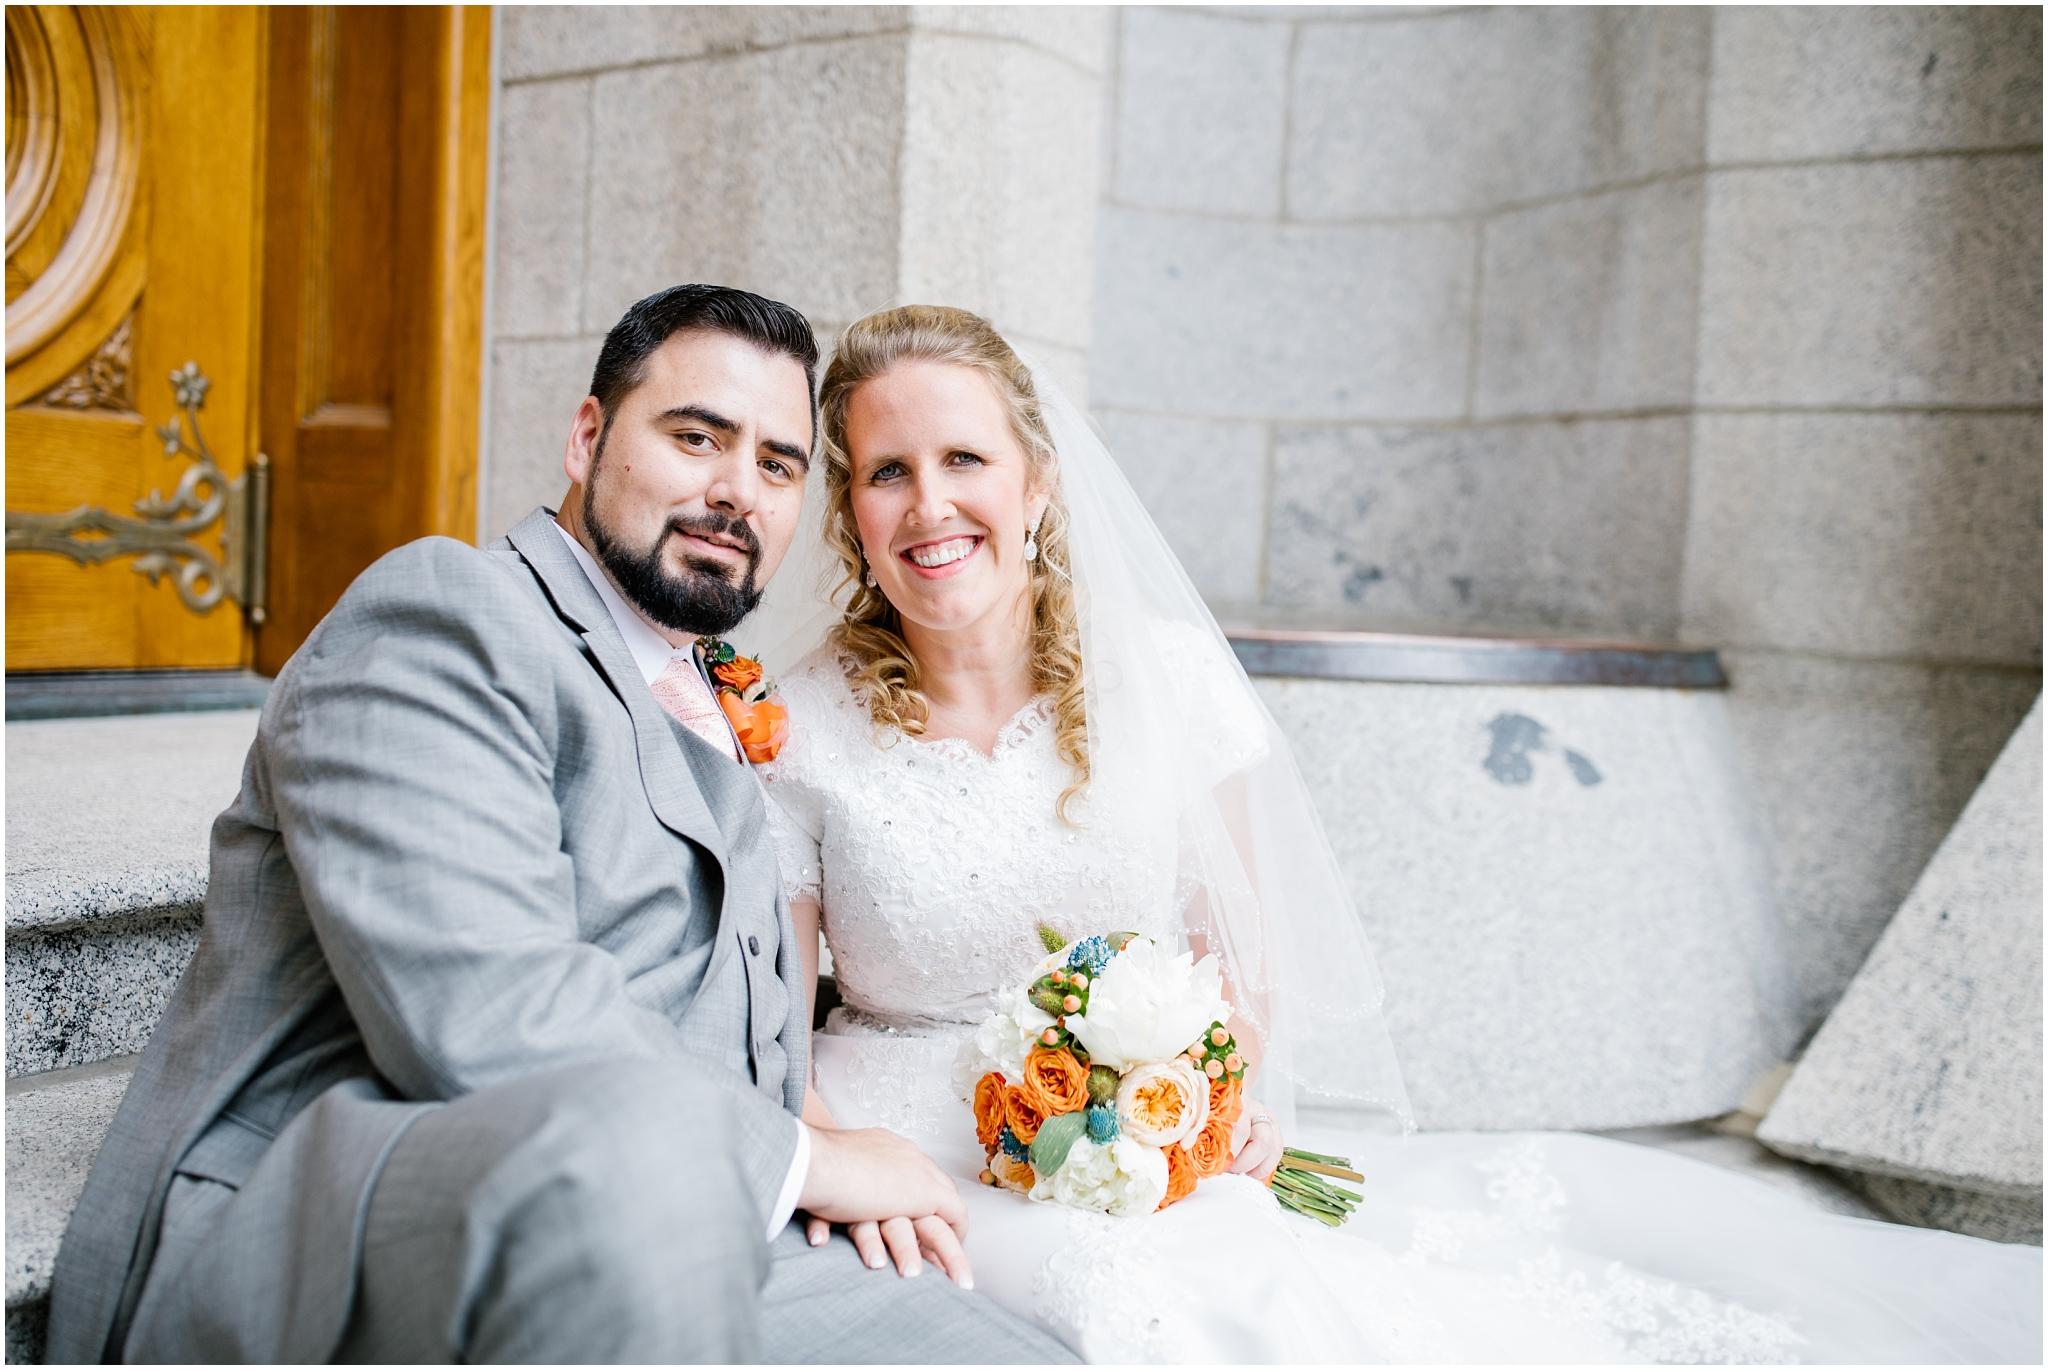 Justin and Melissa-102_Lizzie-B-Imagery-Utah-Wedding-Photographer-Salt-Lake-City-Temple-The-Grand-Ballroom.jpg